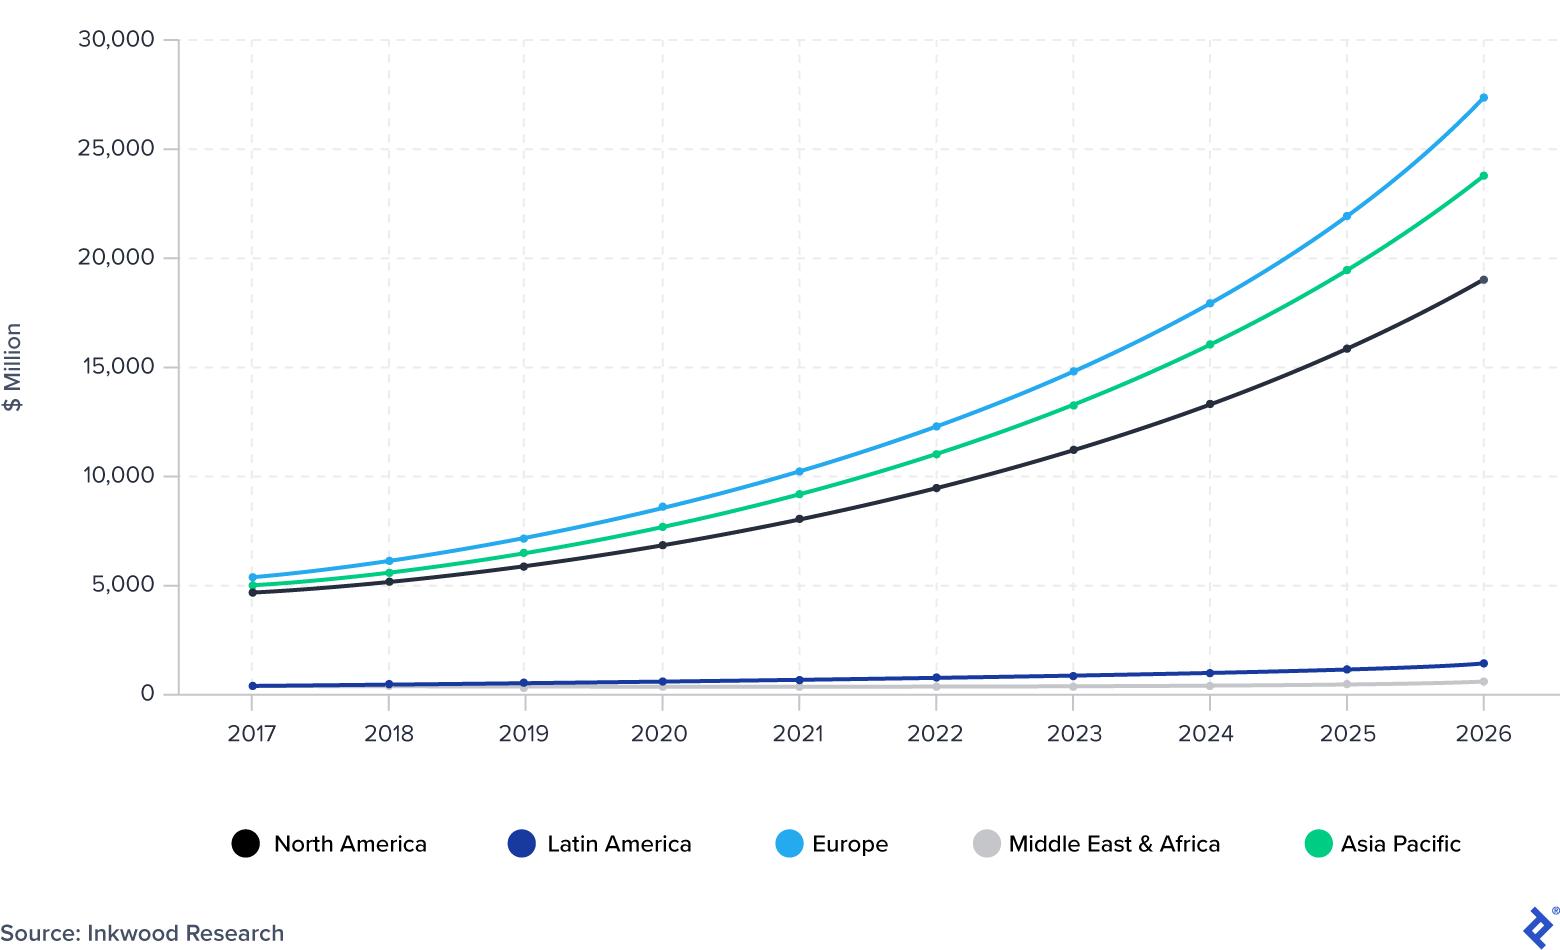 Advanced Driver Assistance System (ADAS) Global Market Size: 2017-2026